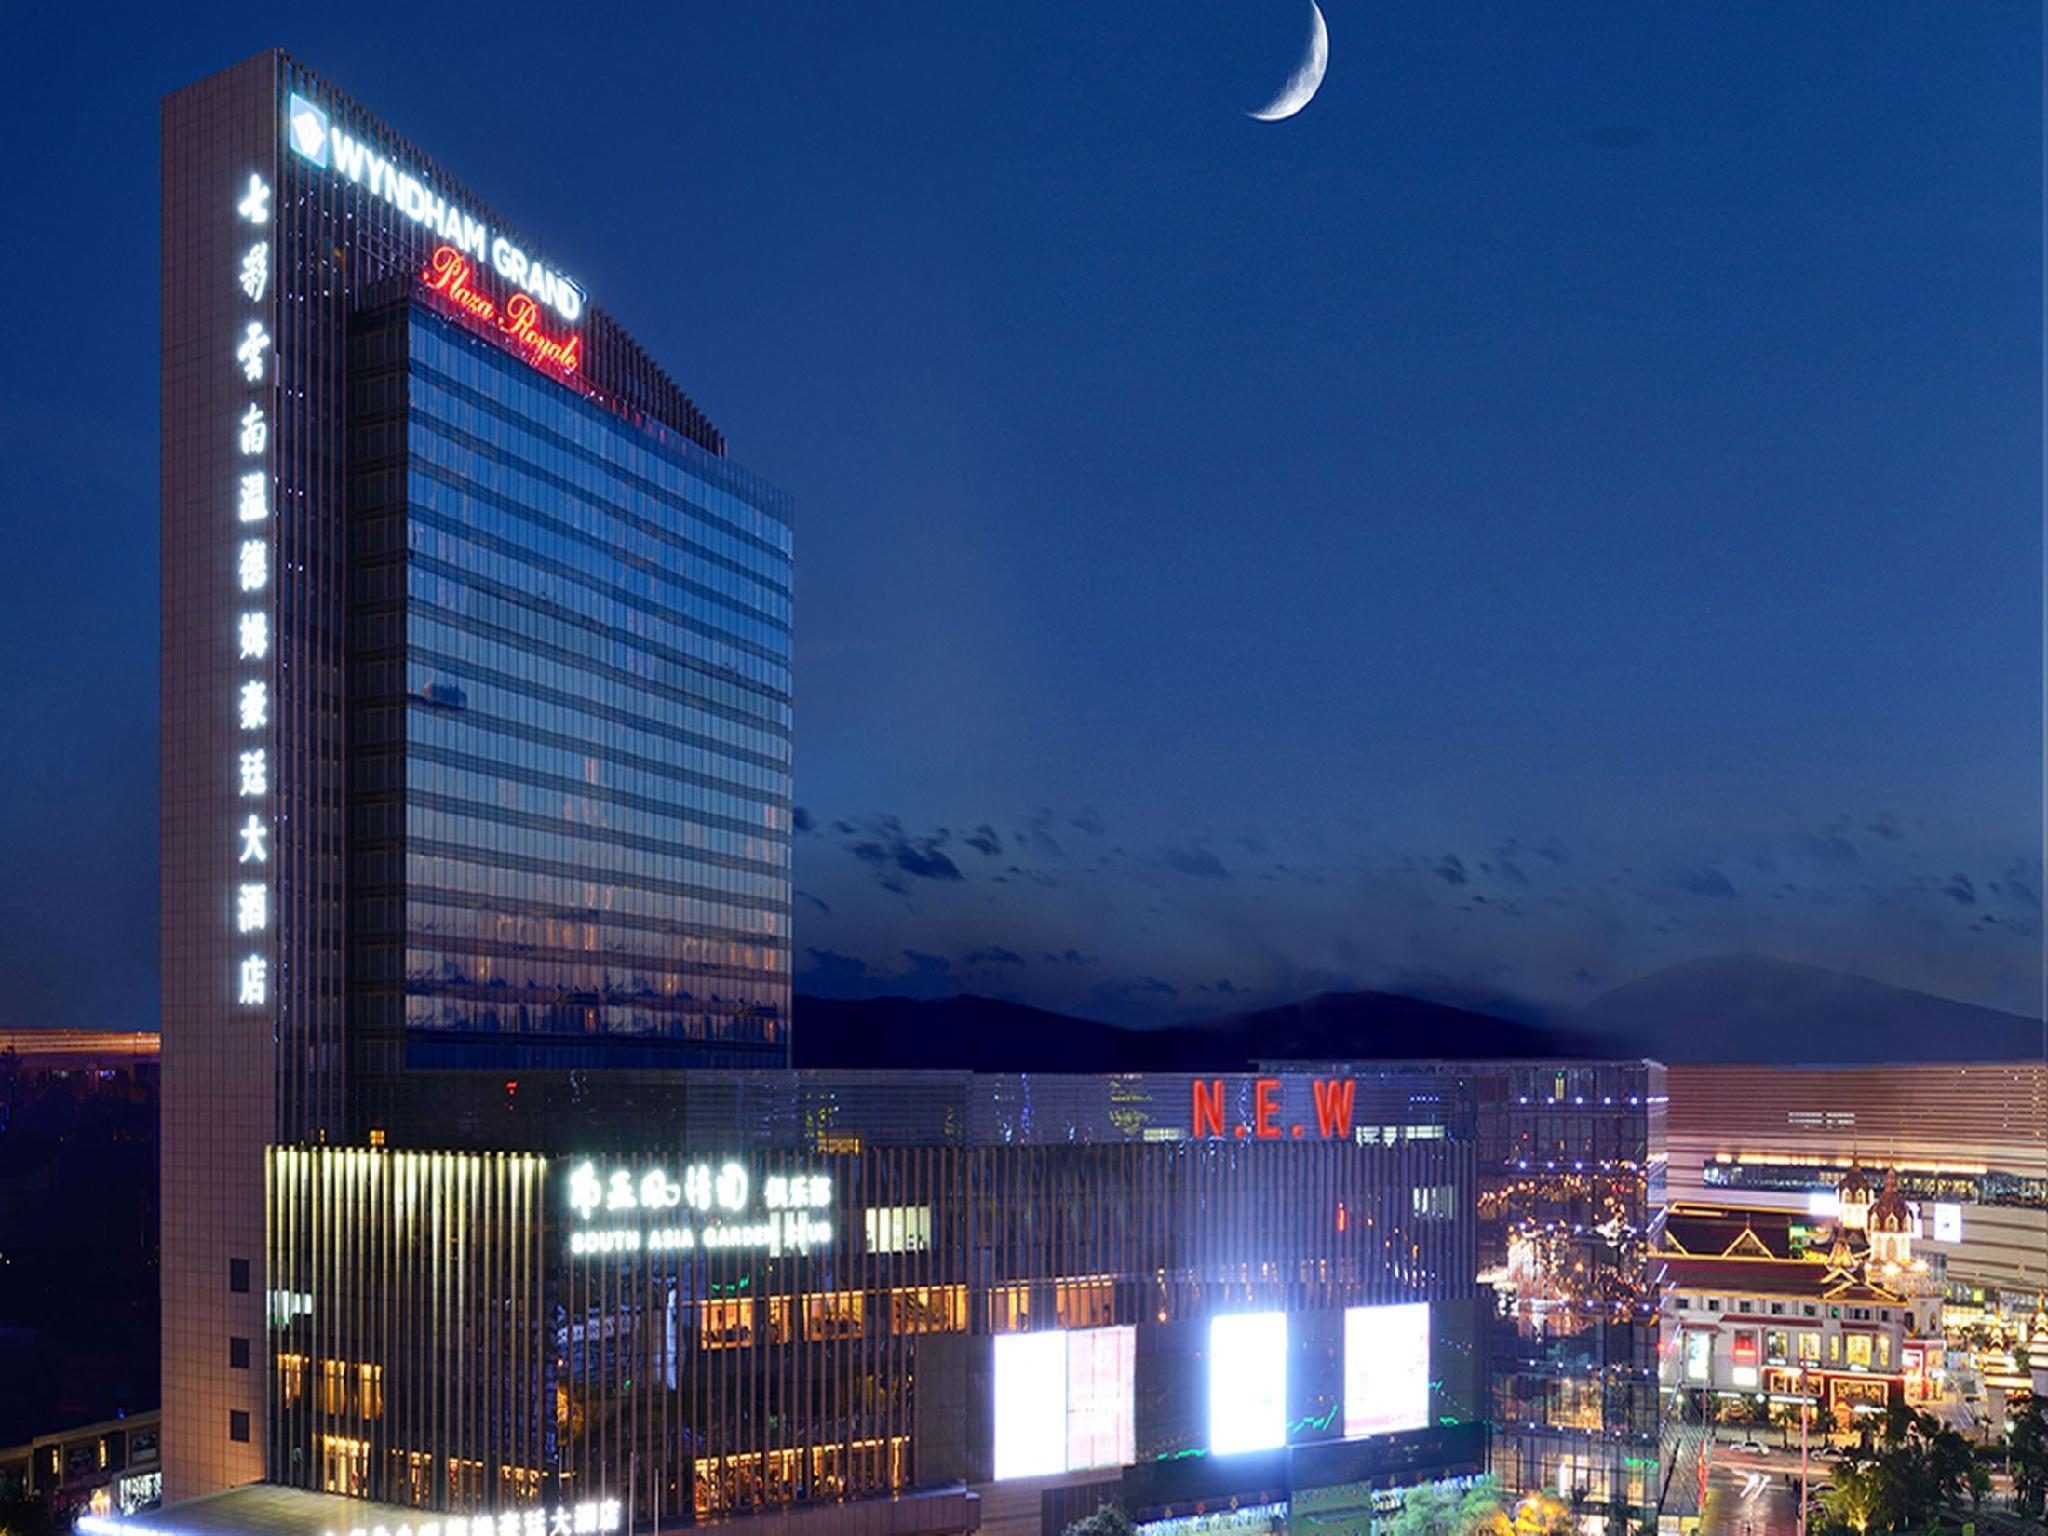 Wyndham Grand Plaza Royale Colorful Yunnan Kunming Hotel